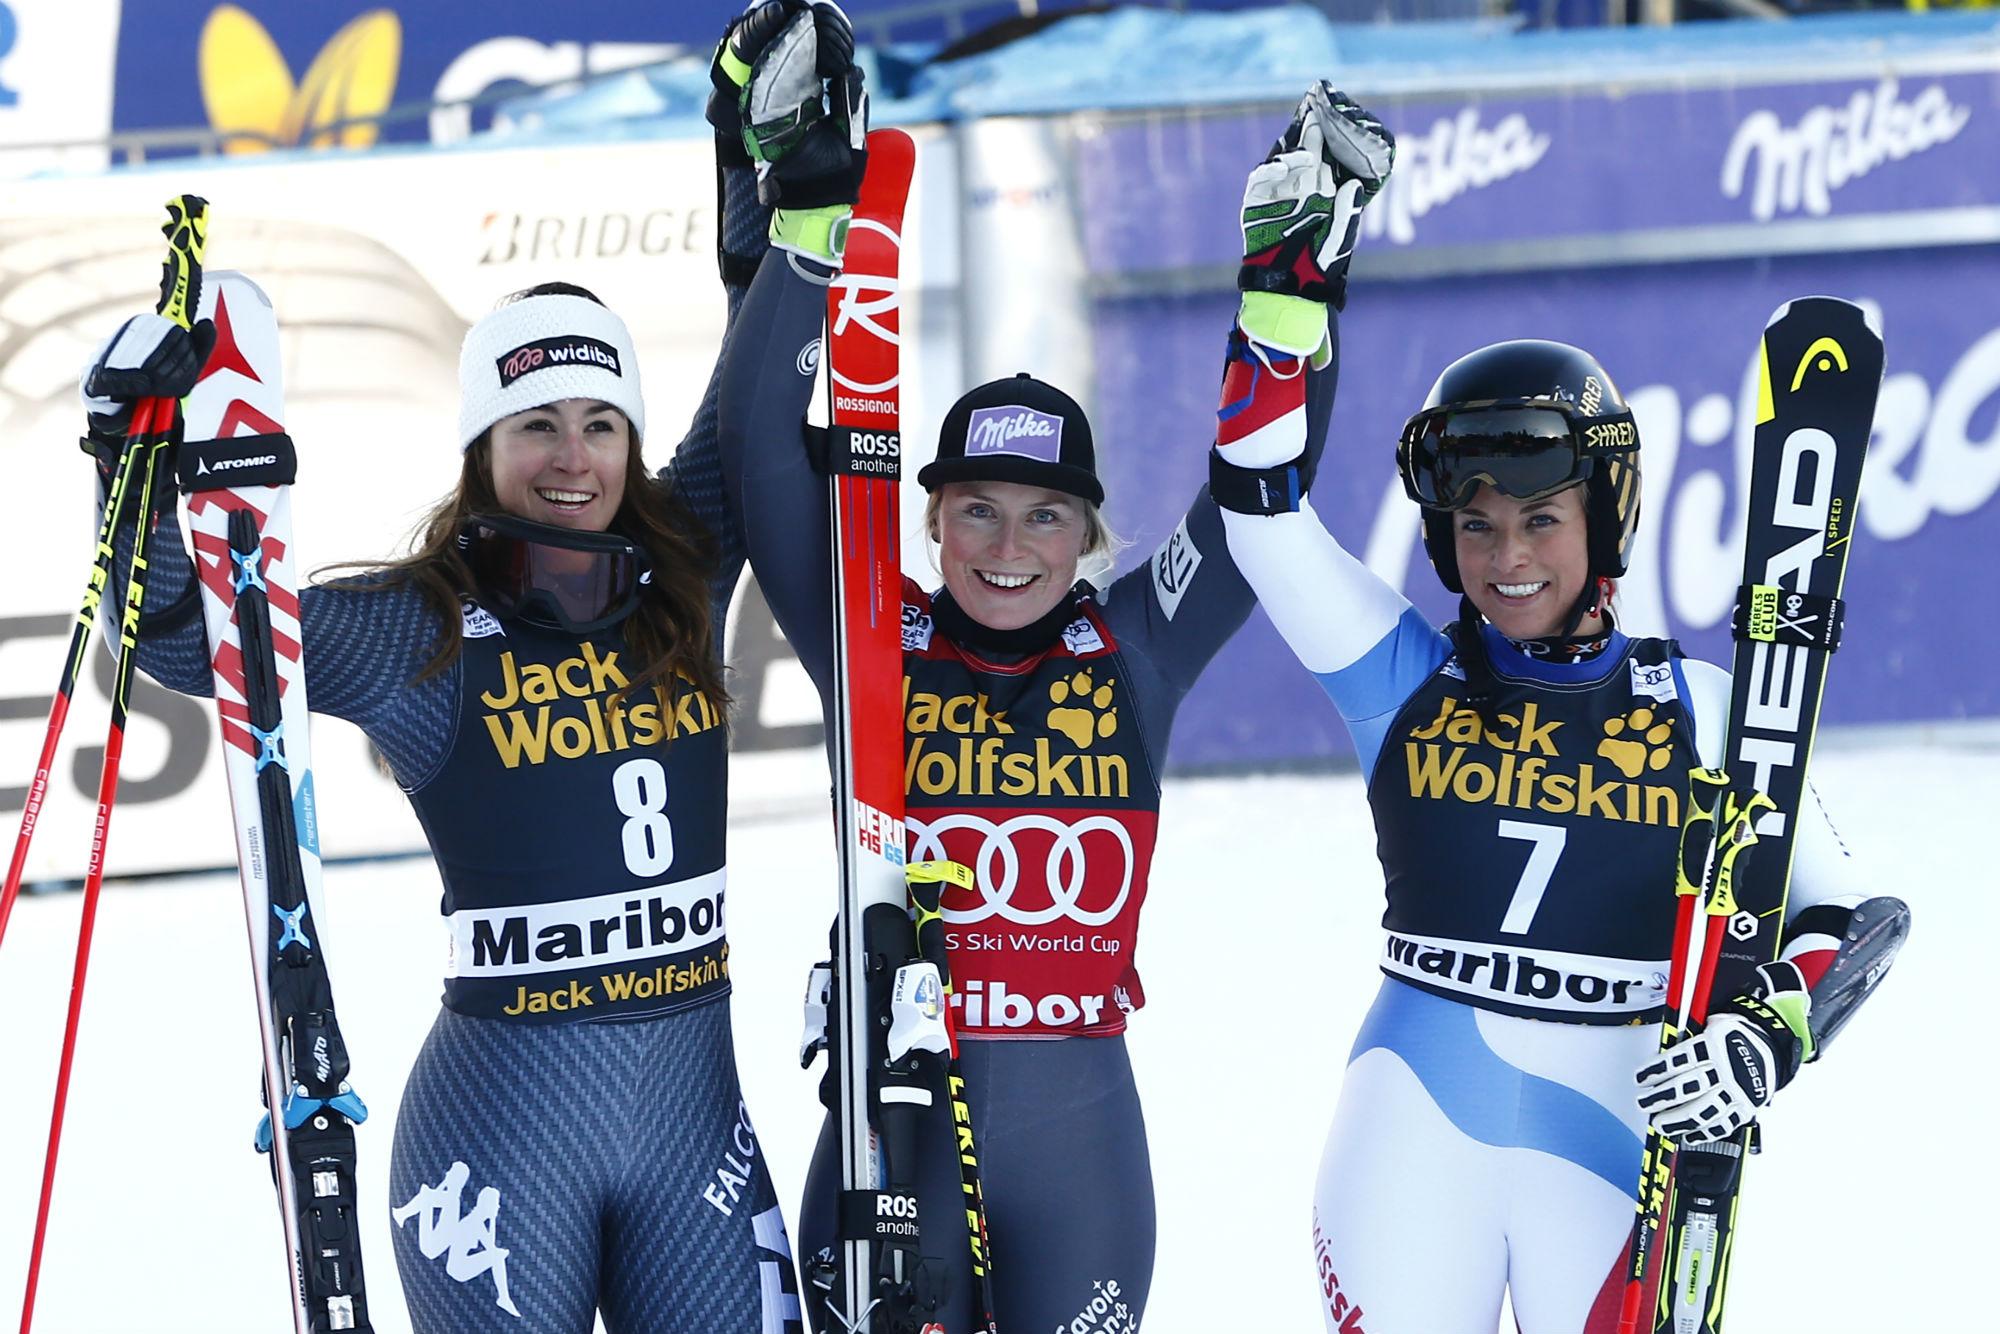 Sofia Goggia, Tessa Worley, Lara Gut sul podio a Maribor (@Zoom agence)